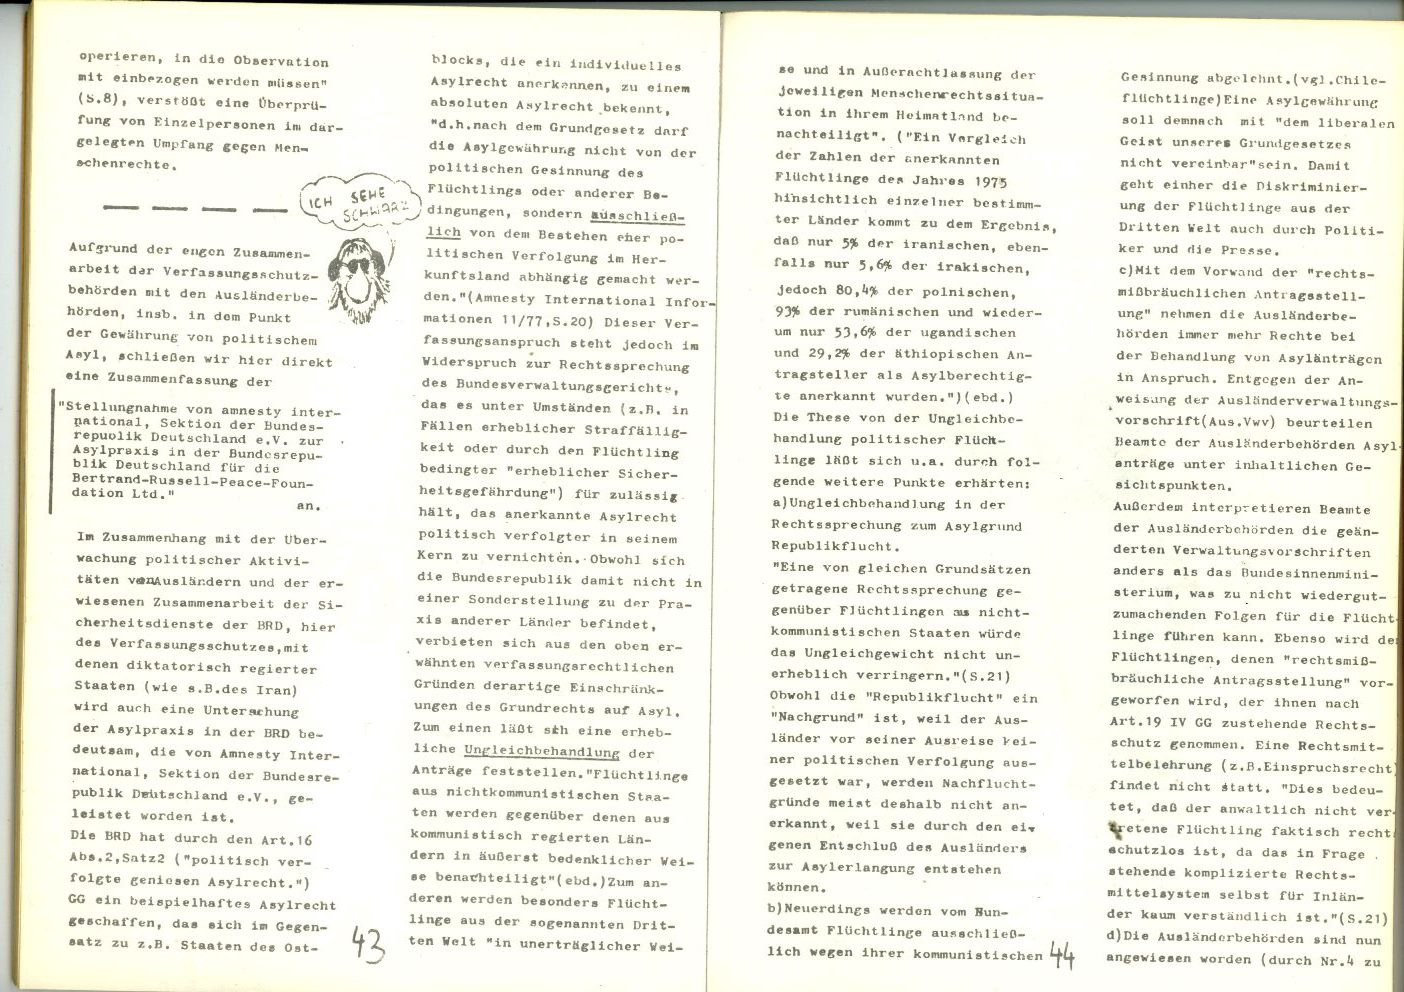 Marburg_Russell_Initiative_1978_23